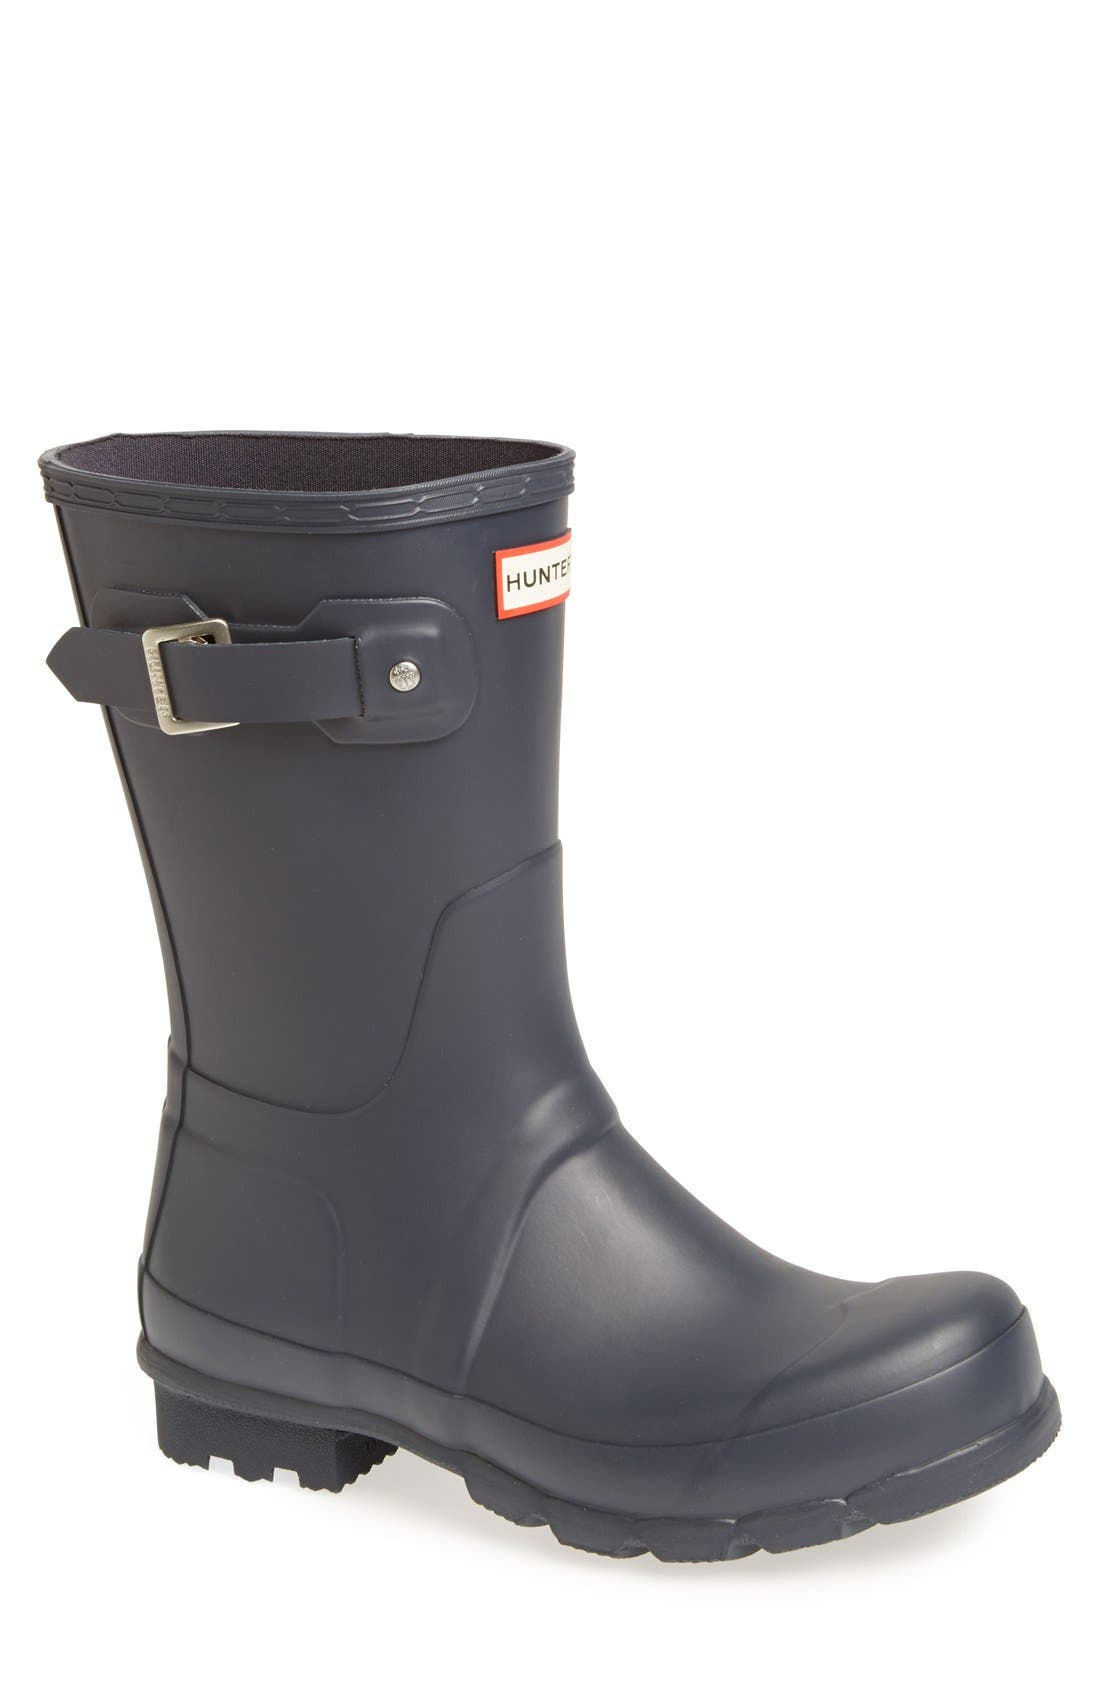 Ralph Lauren Snow Boots High Safety Boys' Shoes